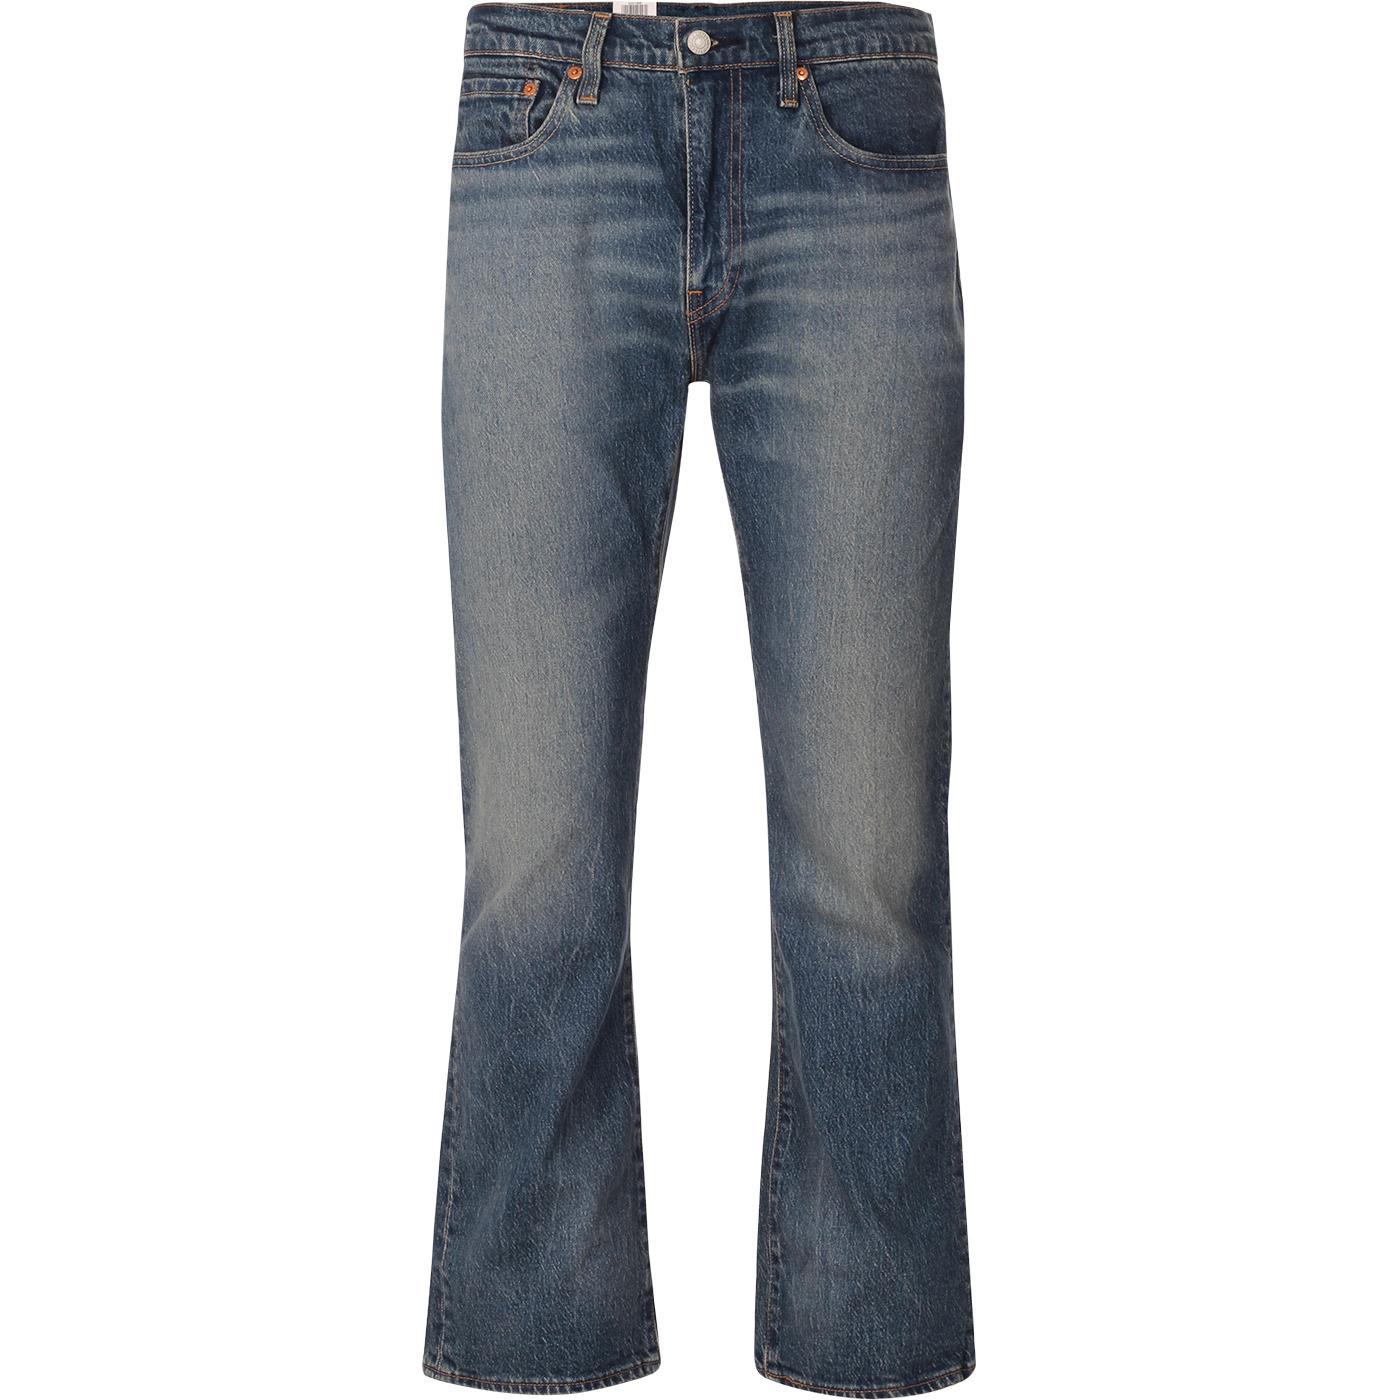 LEVI'S 527 Retro Slim Bootcut Jeans (Squash Train)